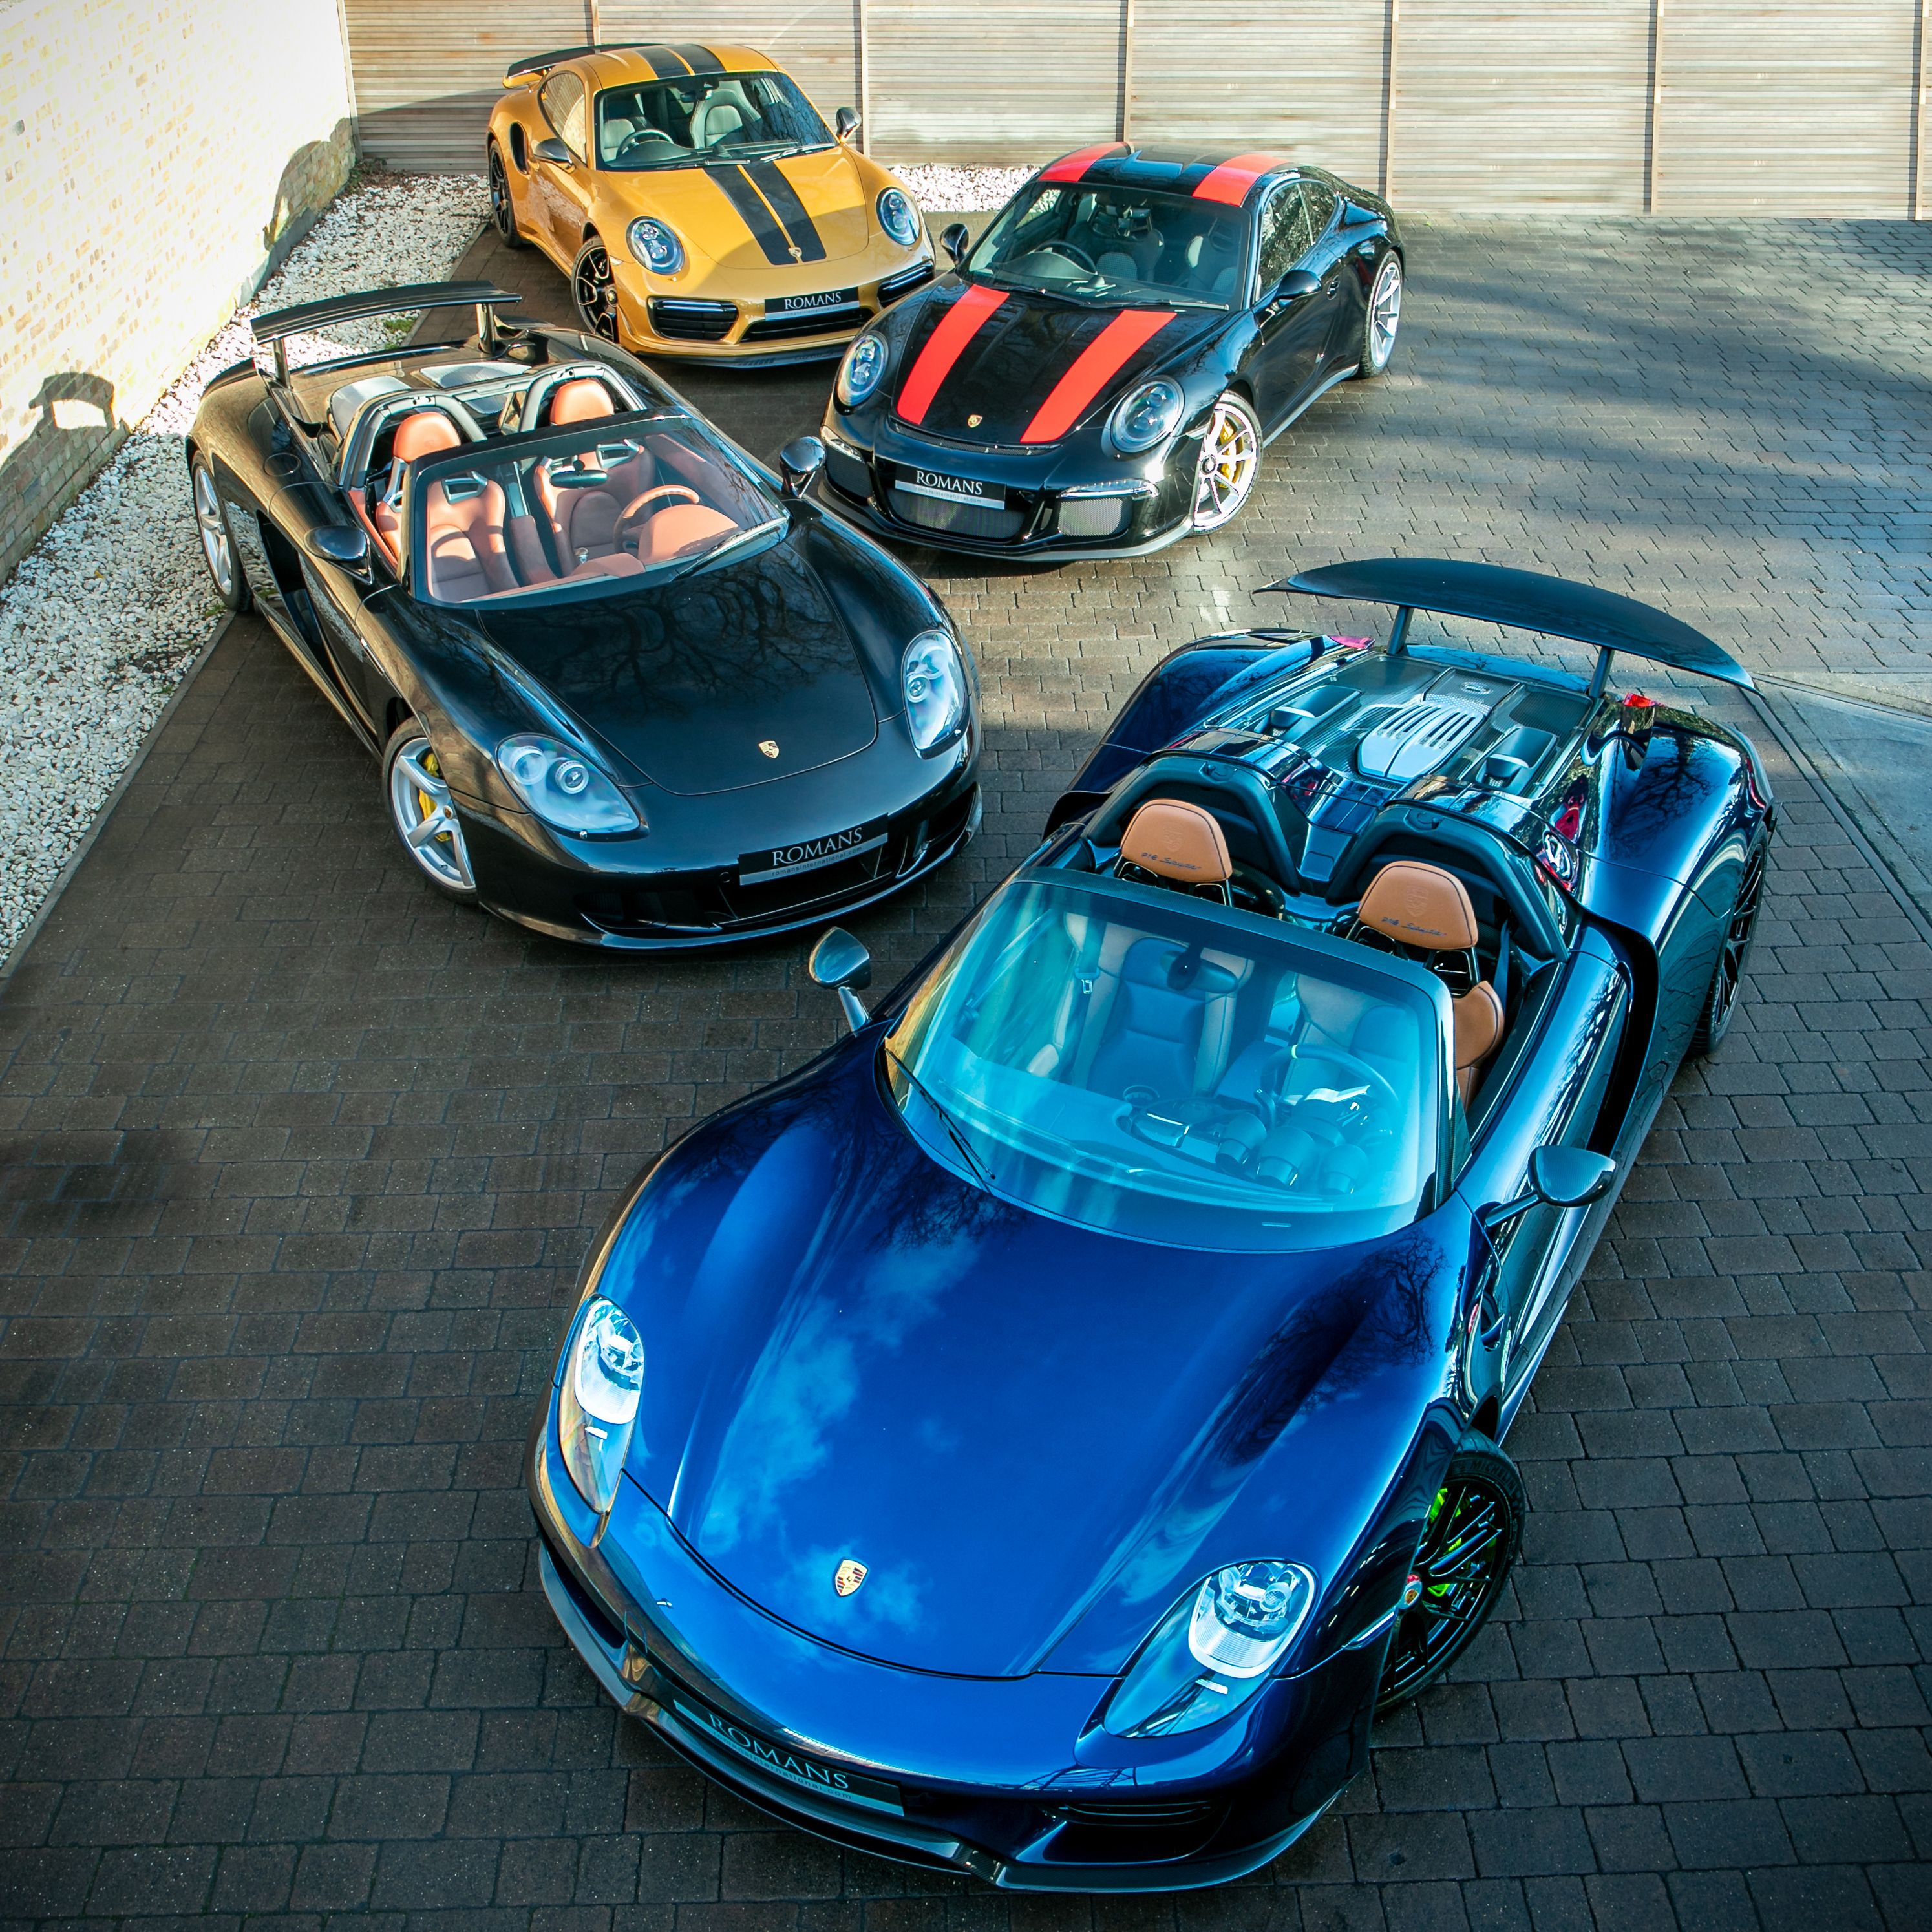 Current Porsche Models: Porsche, Porsche For Sale, Super Cars